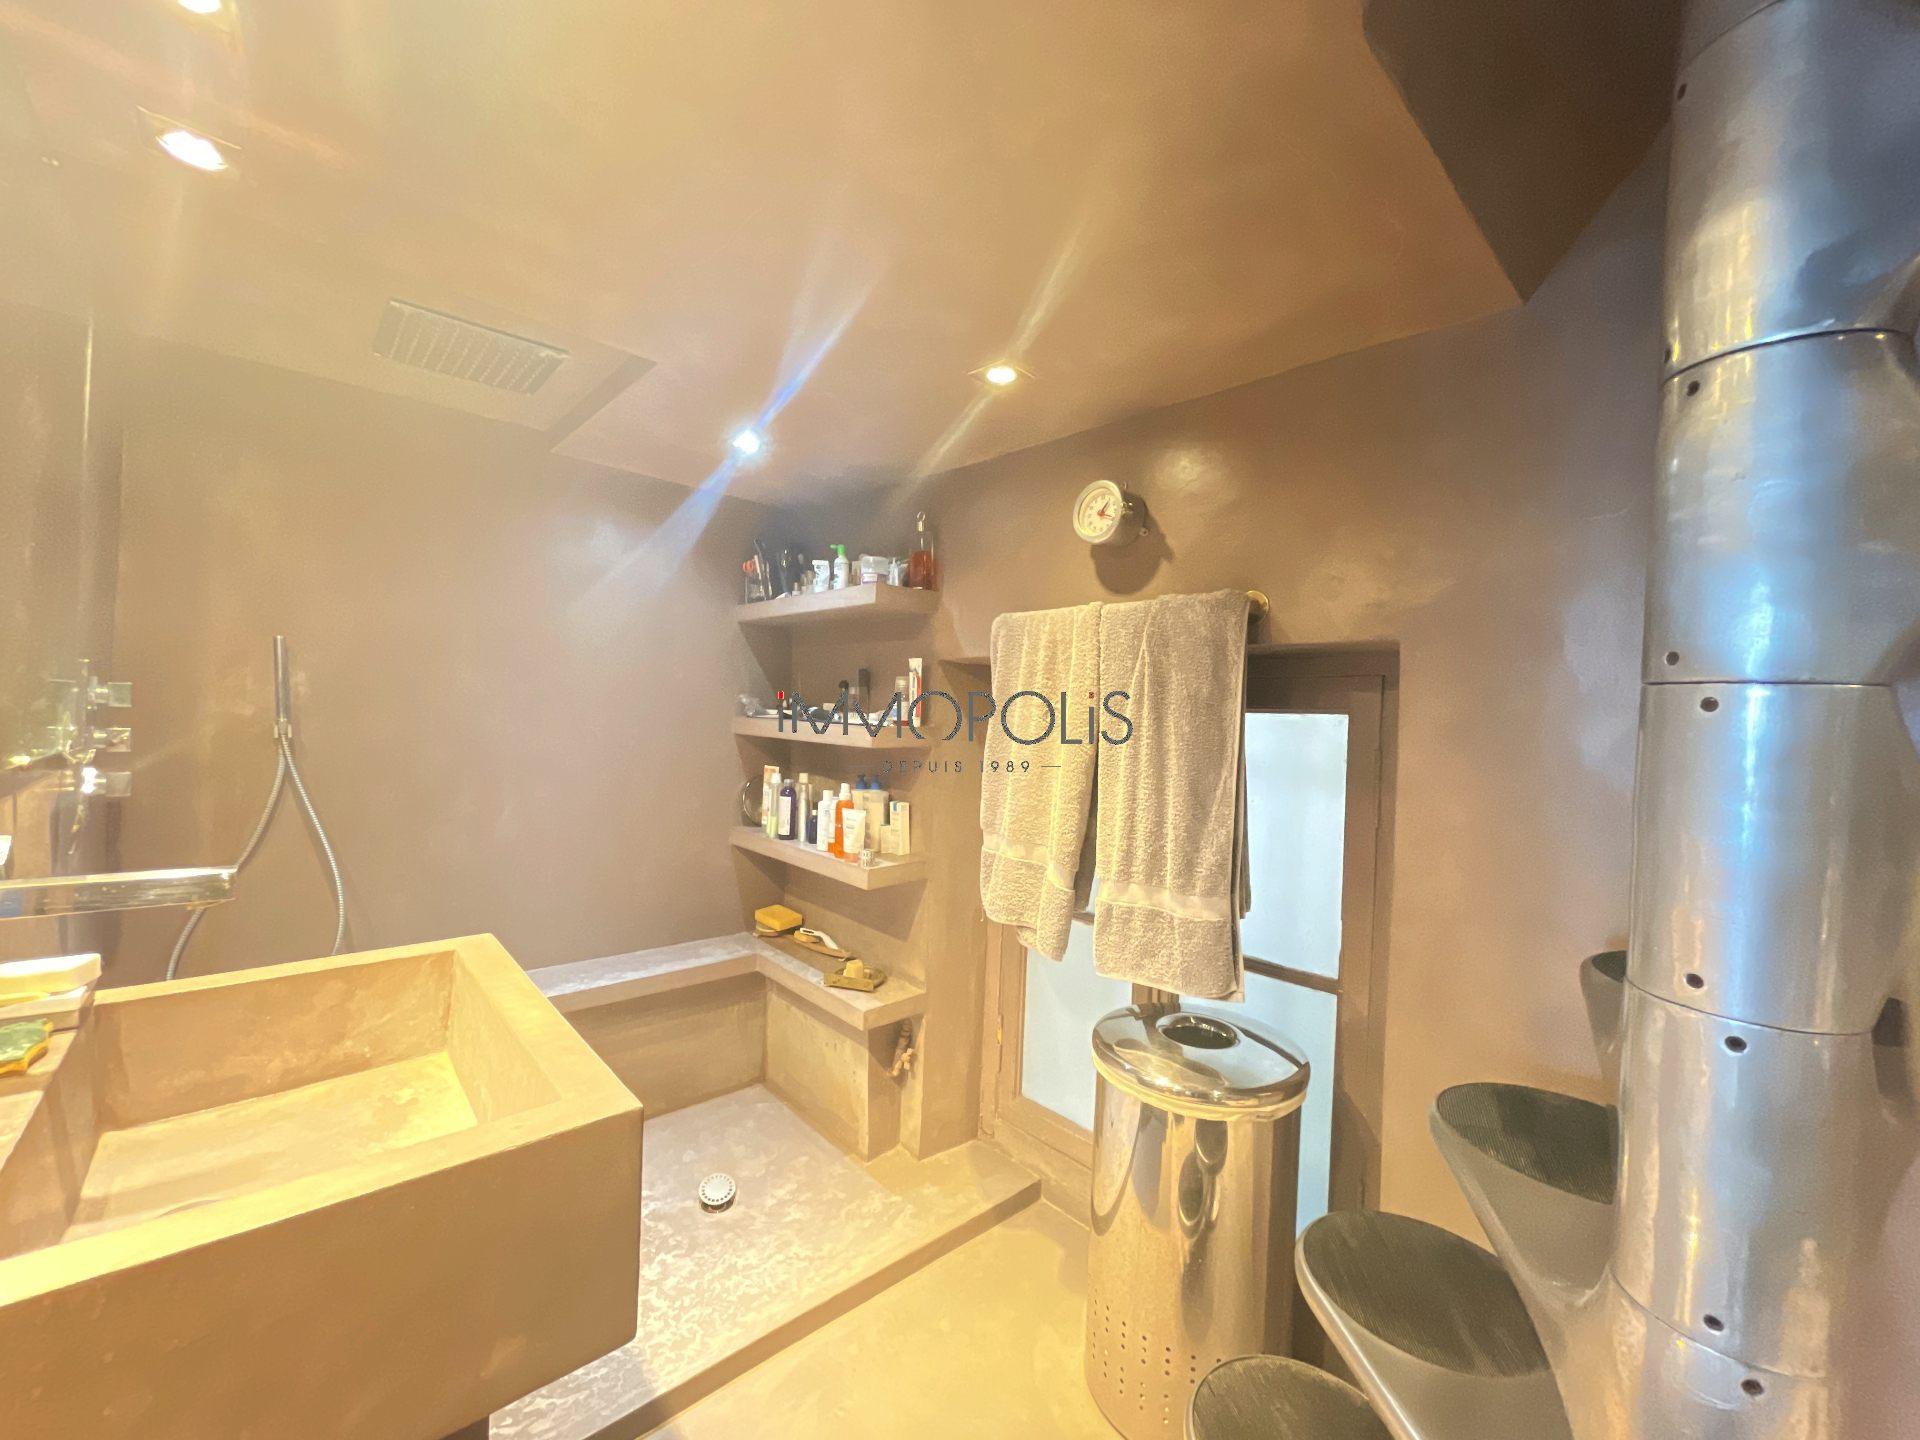 3 rooms Rue Ravignan duplex + room of service! 6